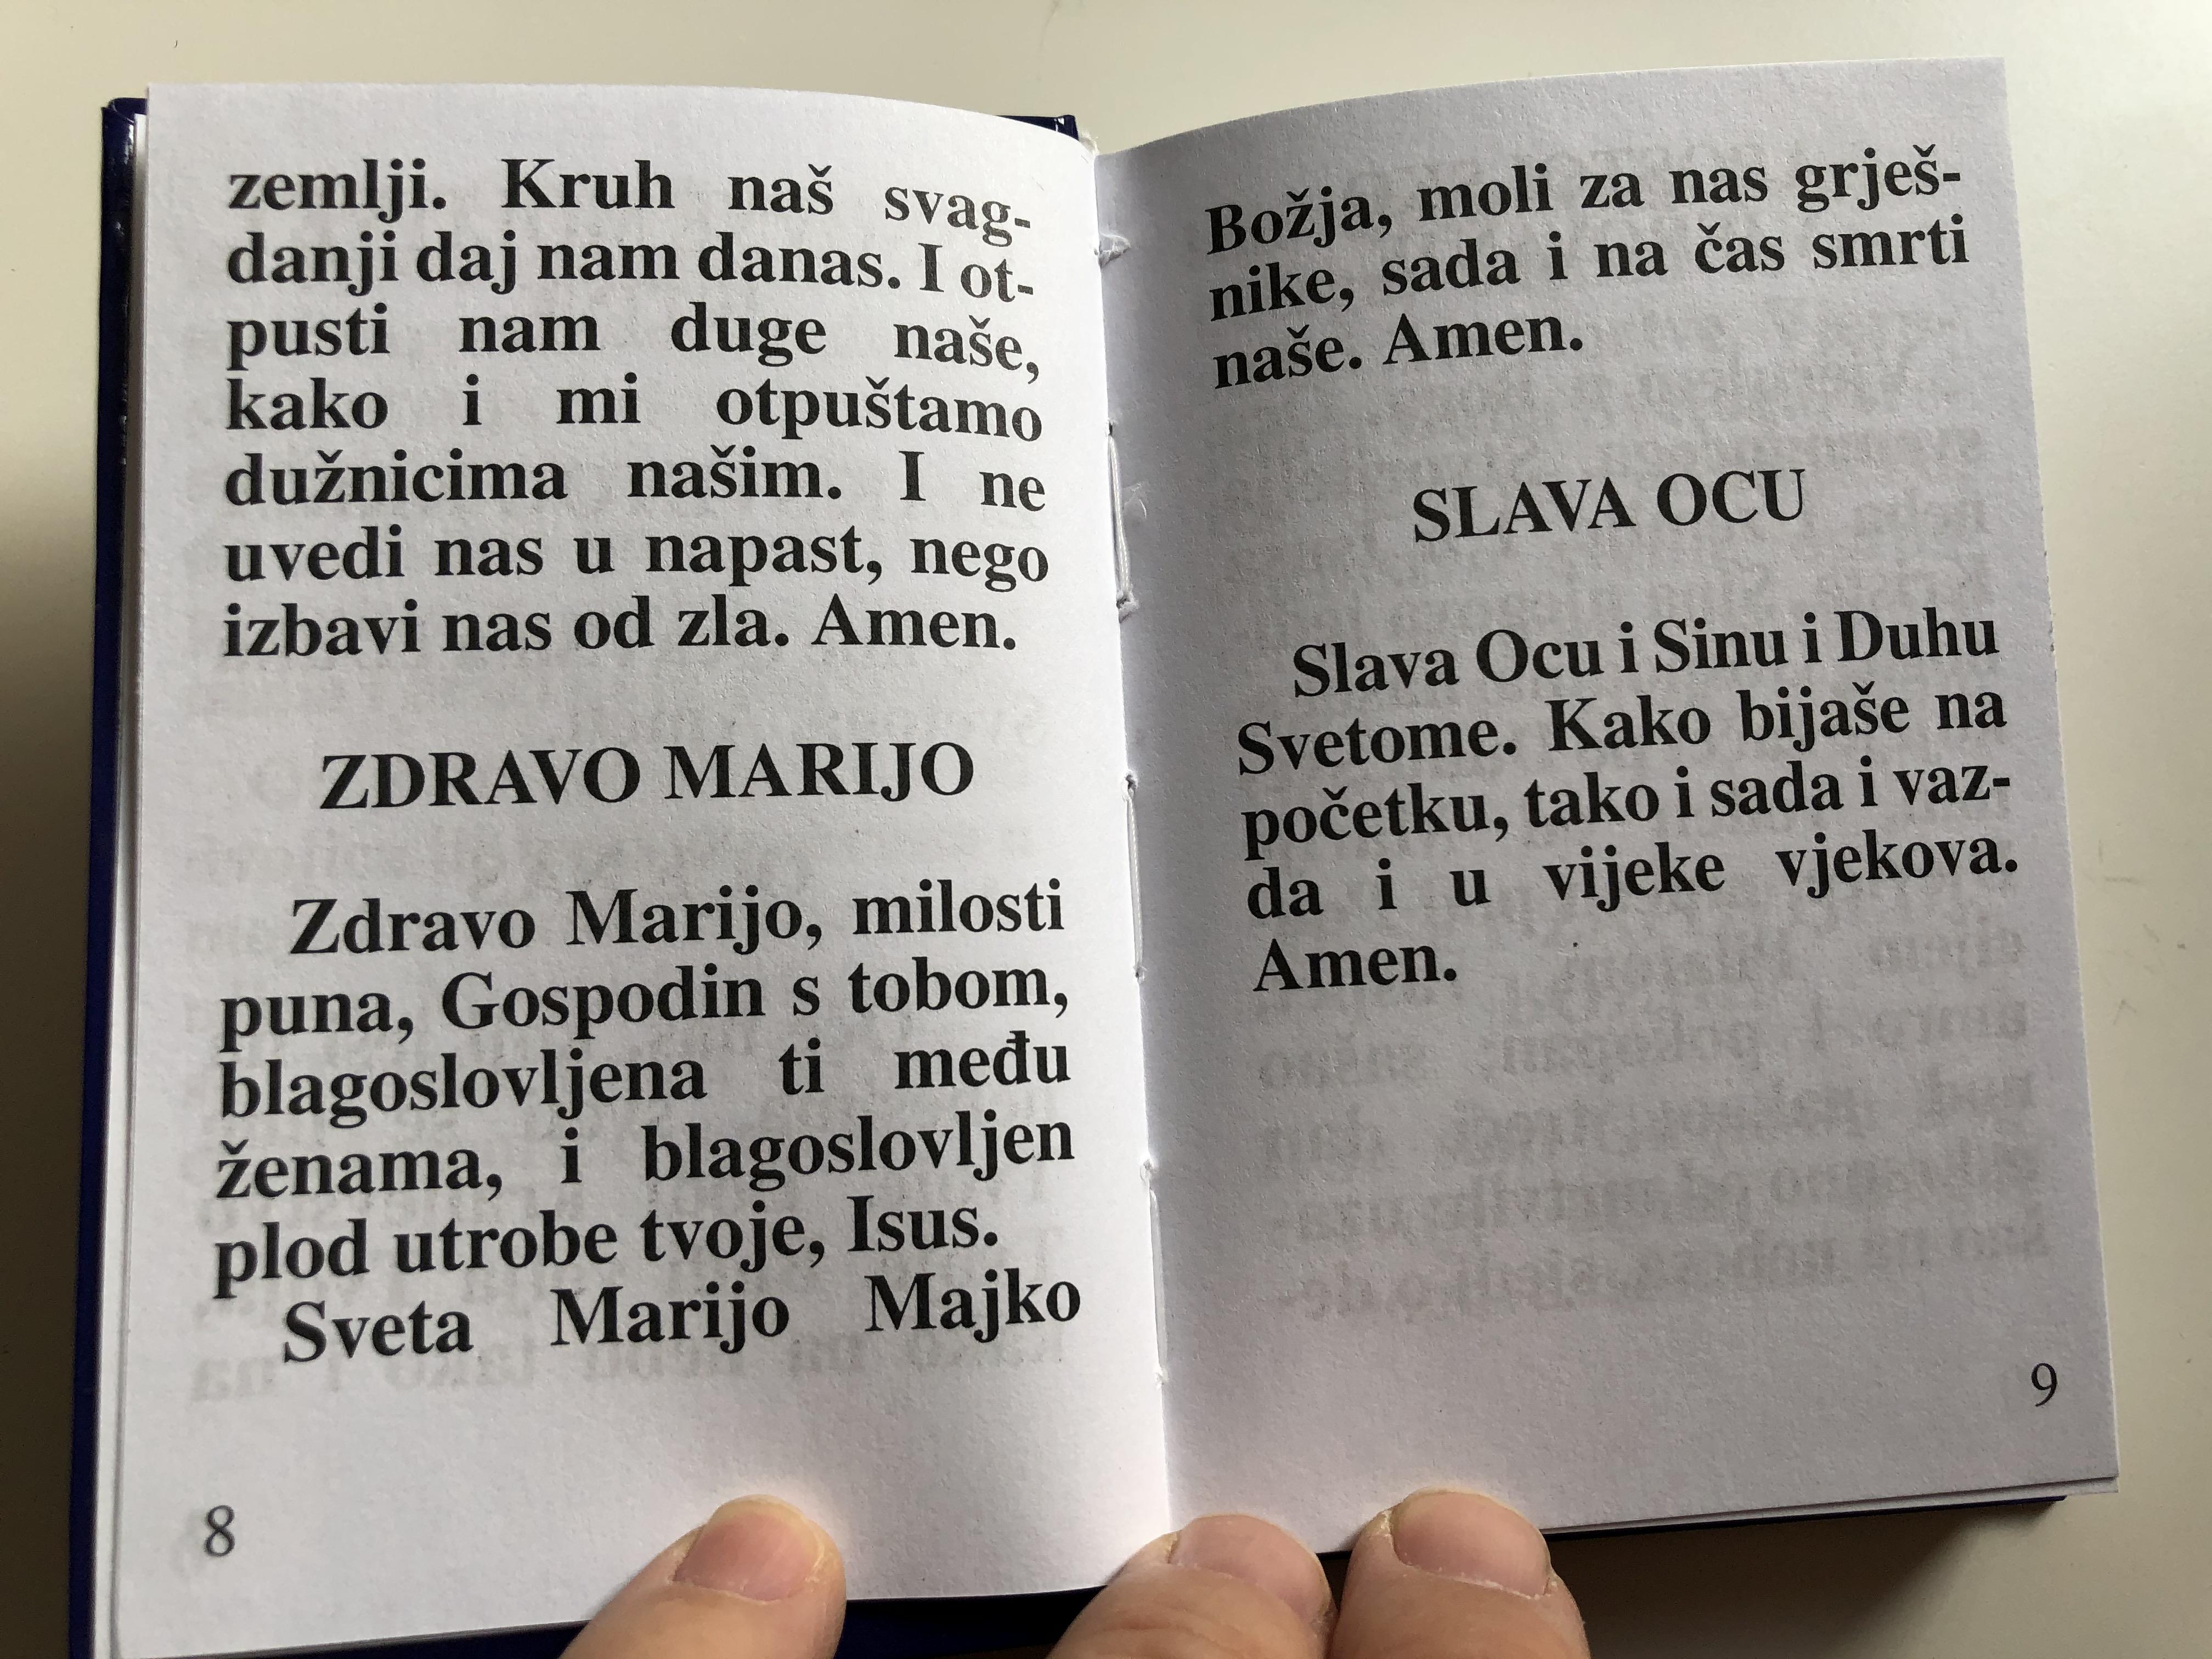 gospodin-moj-i-bog-moj-by-ivan-zirdum-my-lord-and-my-god-4.jpg